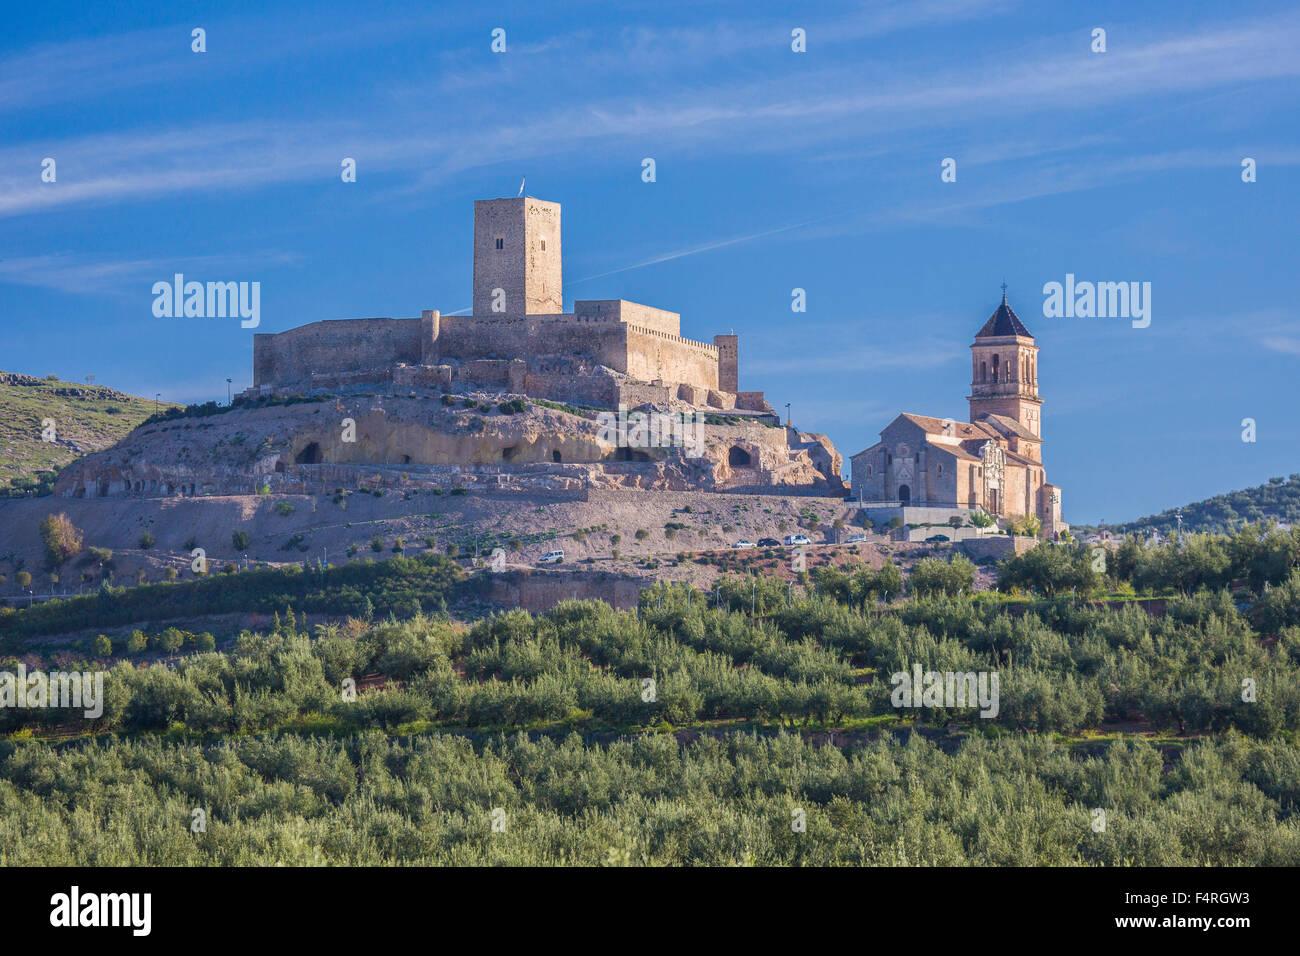 Alcaudete, town, Andalusia, Jaen, Landscape, Spain, Europe, Spring, architecture, castle, church, church, olive, Stock Photo